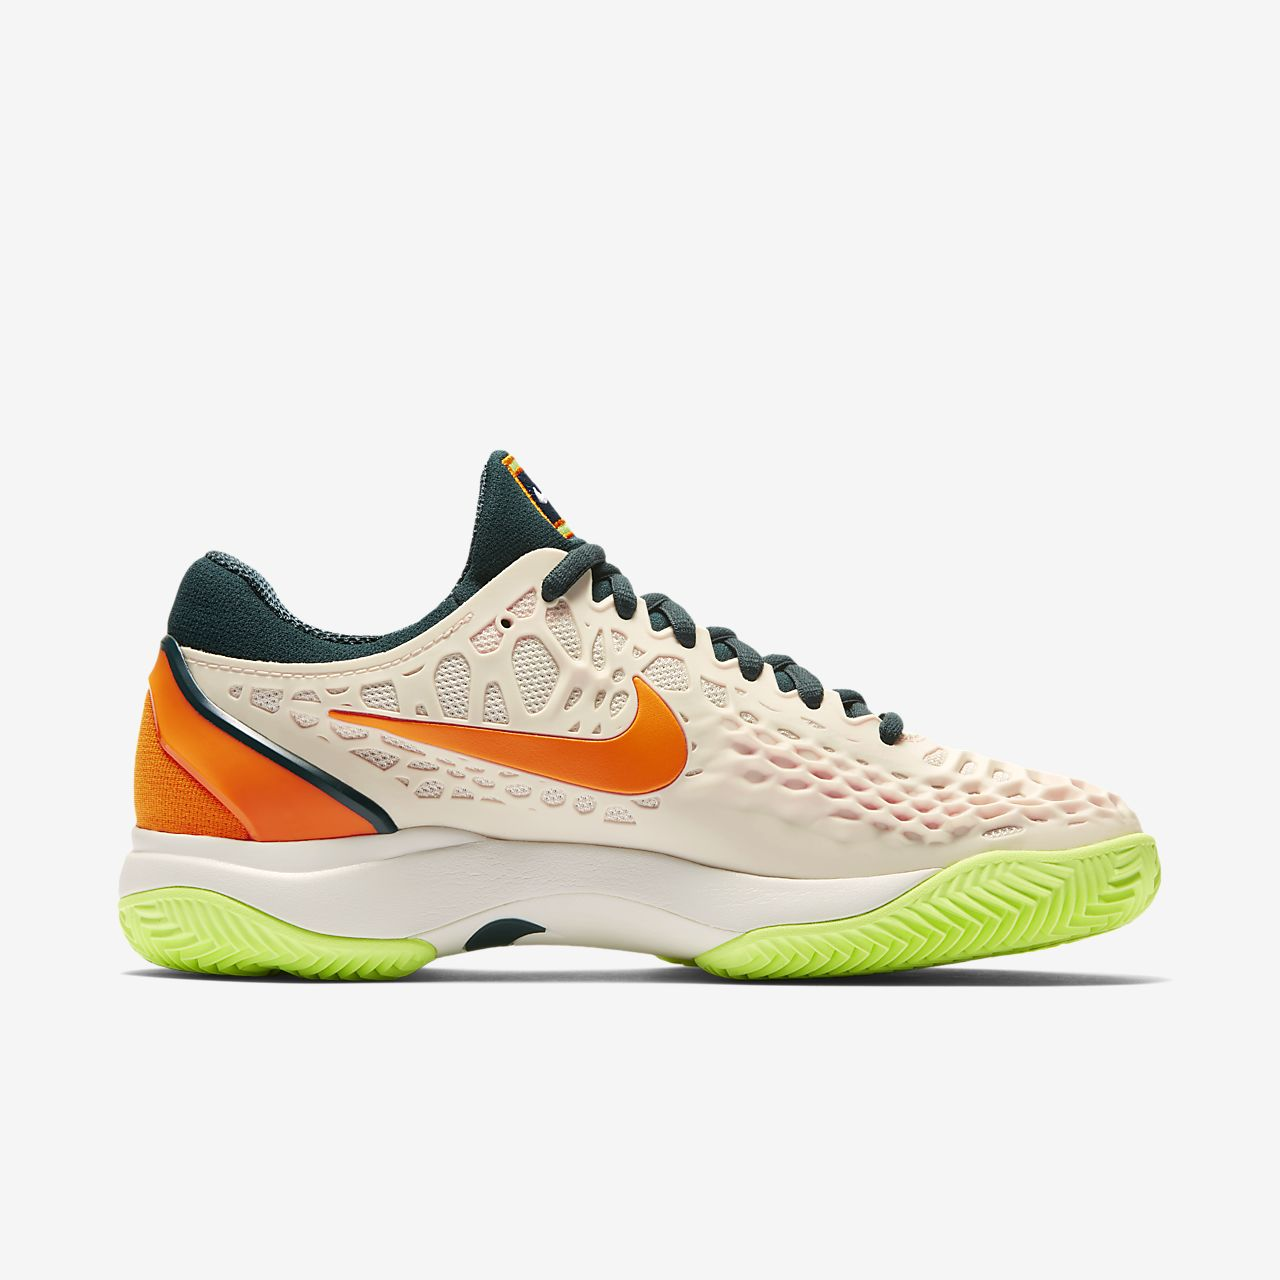 Donna Zoom It 3 Clay Nike Tennis Bqwbxoh Cage Da Scarpa E8f1q